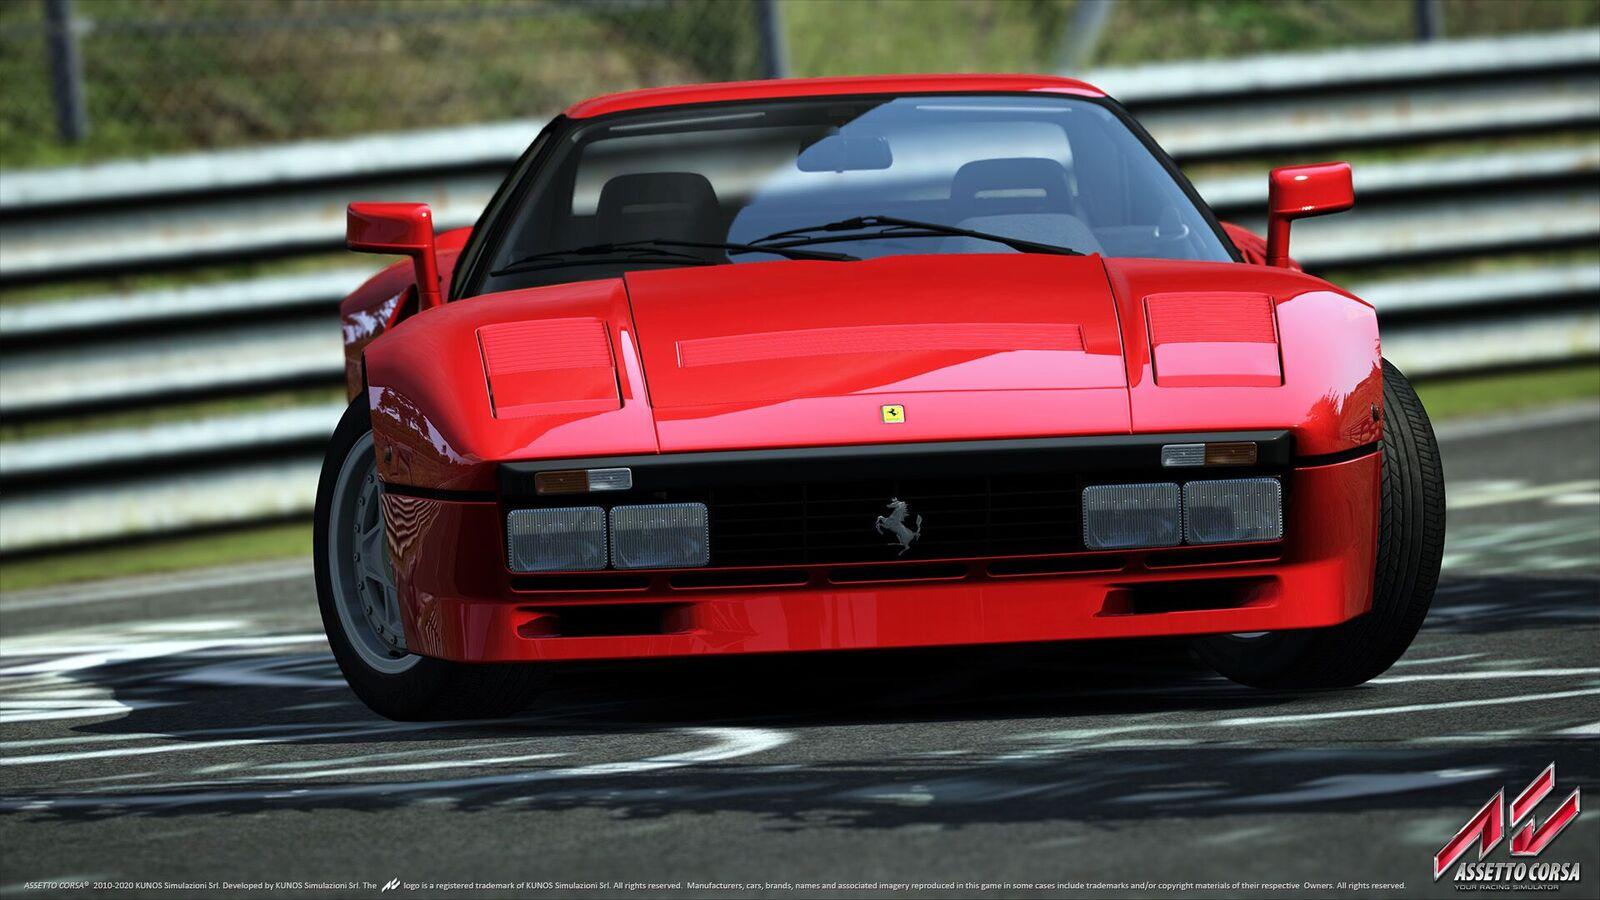 Assetto Corsa DLC Ferrari